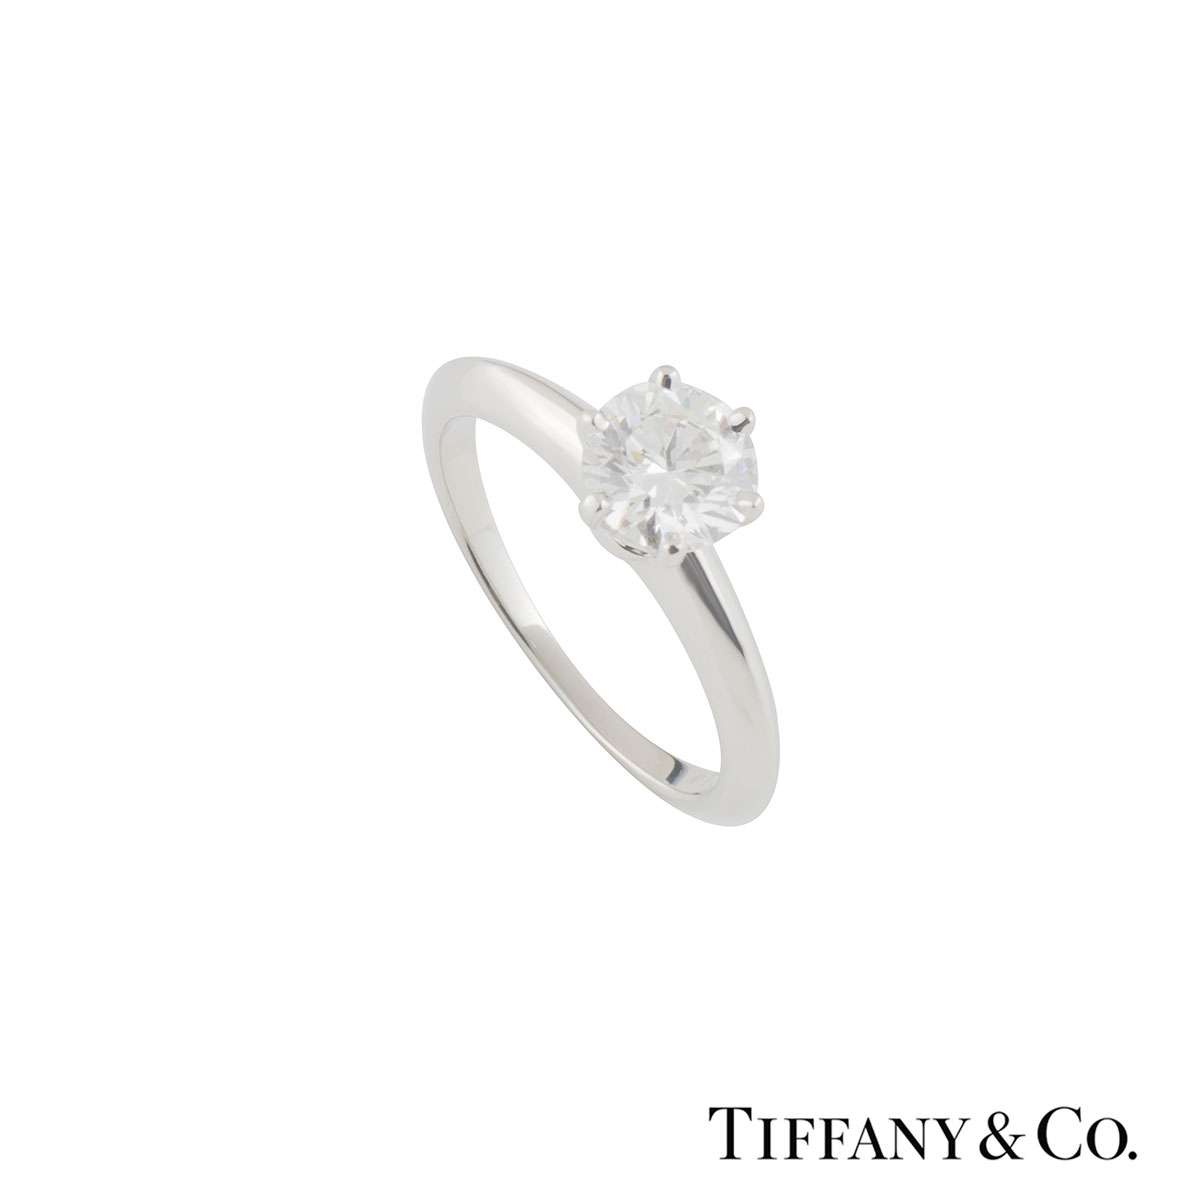 Tiffany & Co. Setting Band Ring XXX 1.12ct I/VVS1